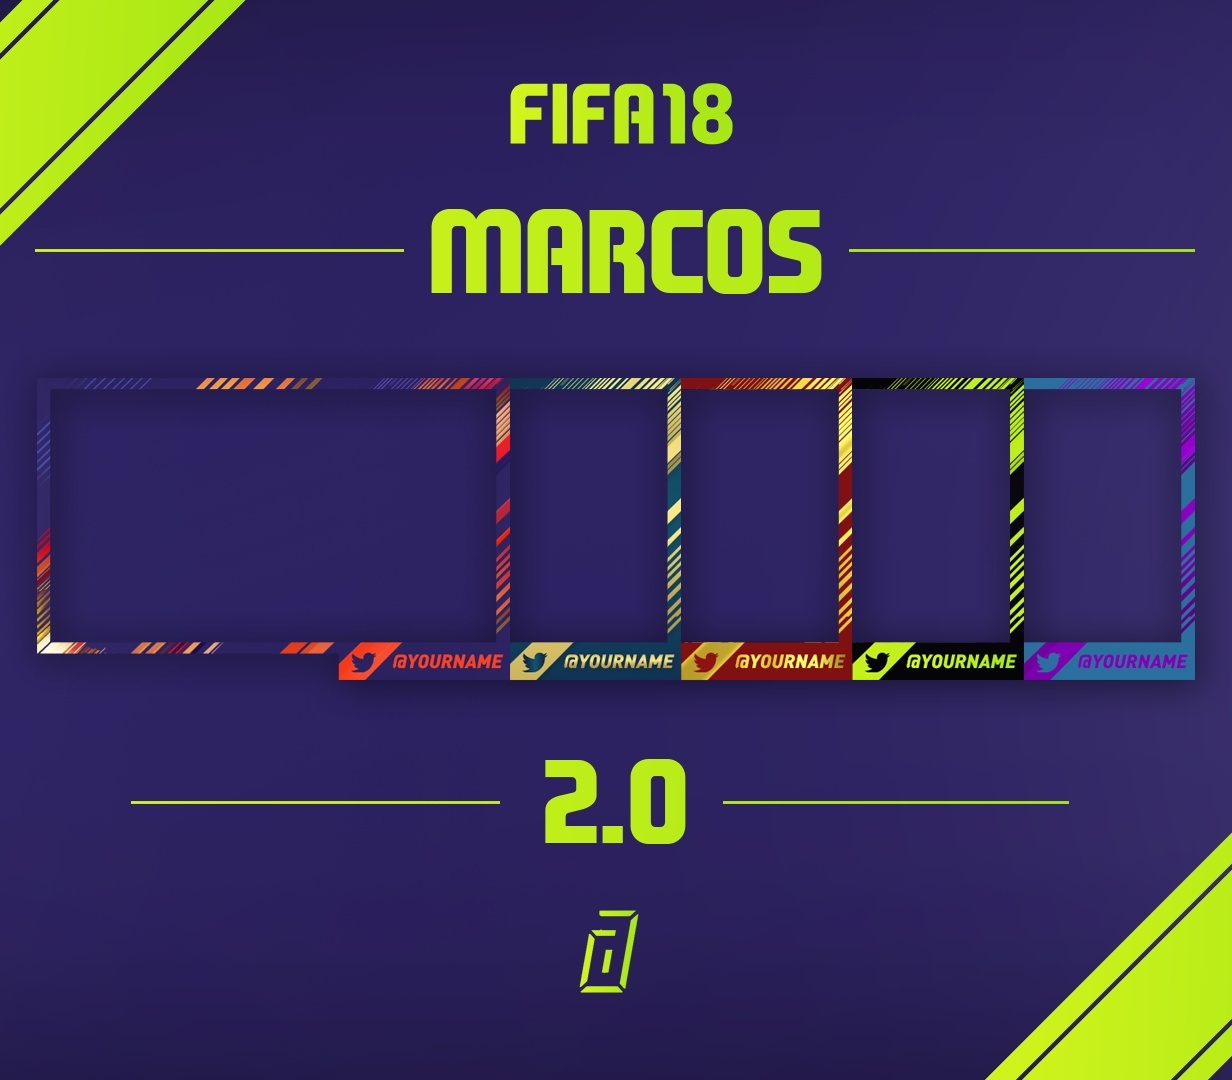 FIFA18 | MARCOS 2.0